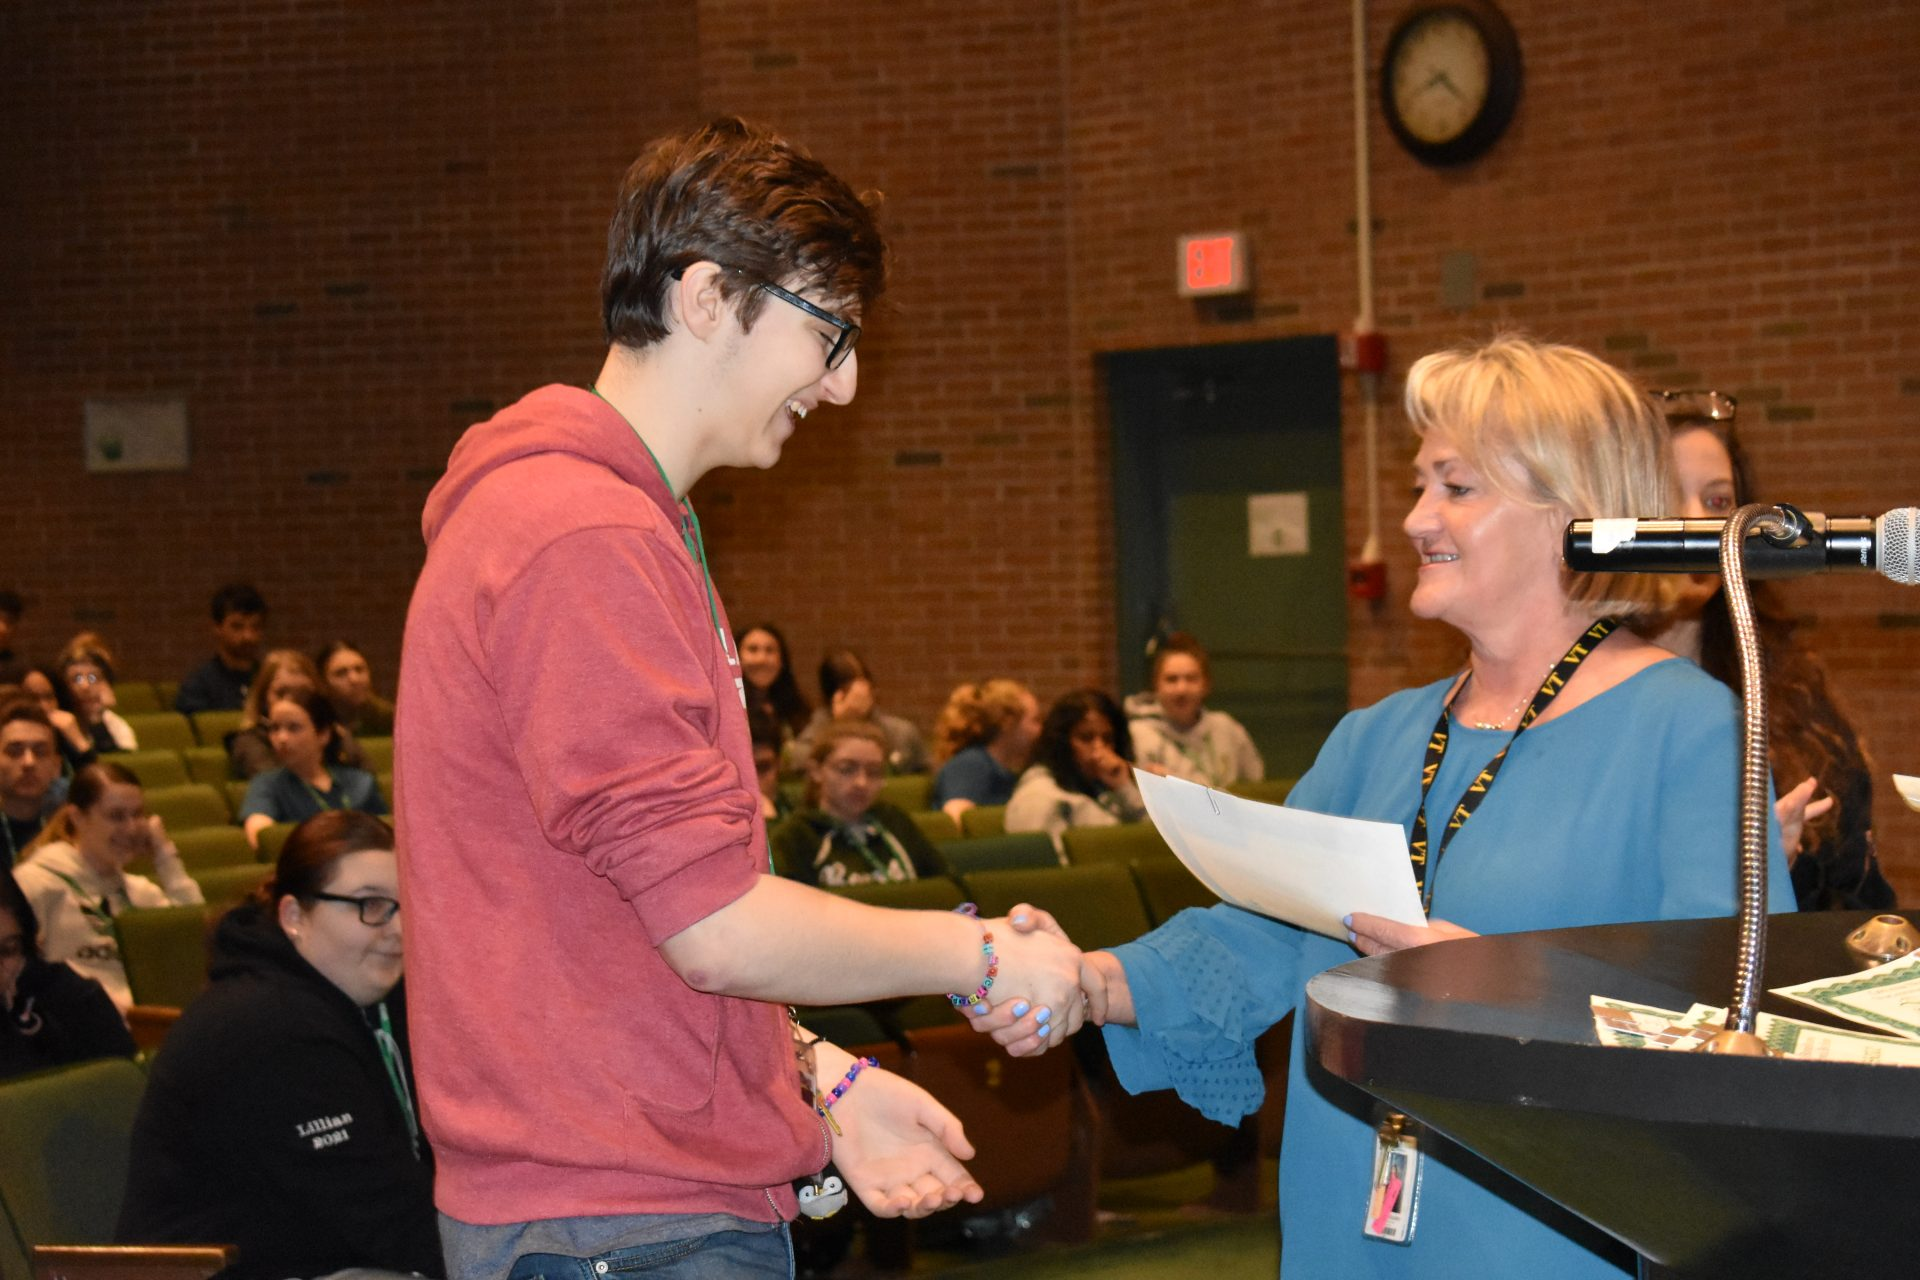 Renaissance Awards Ms. Bouley shaking a students hand